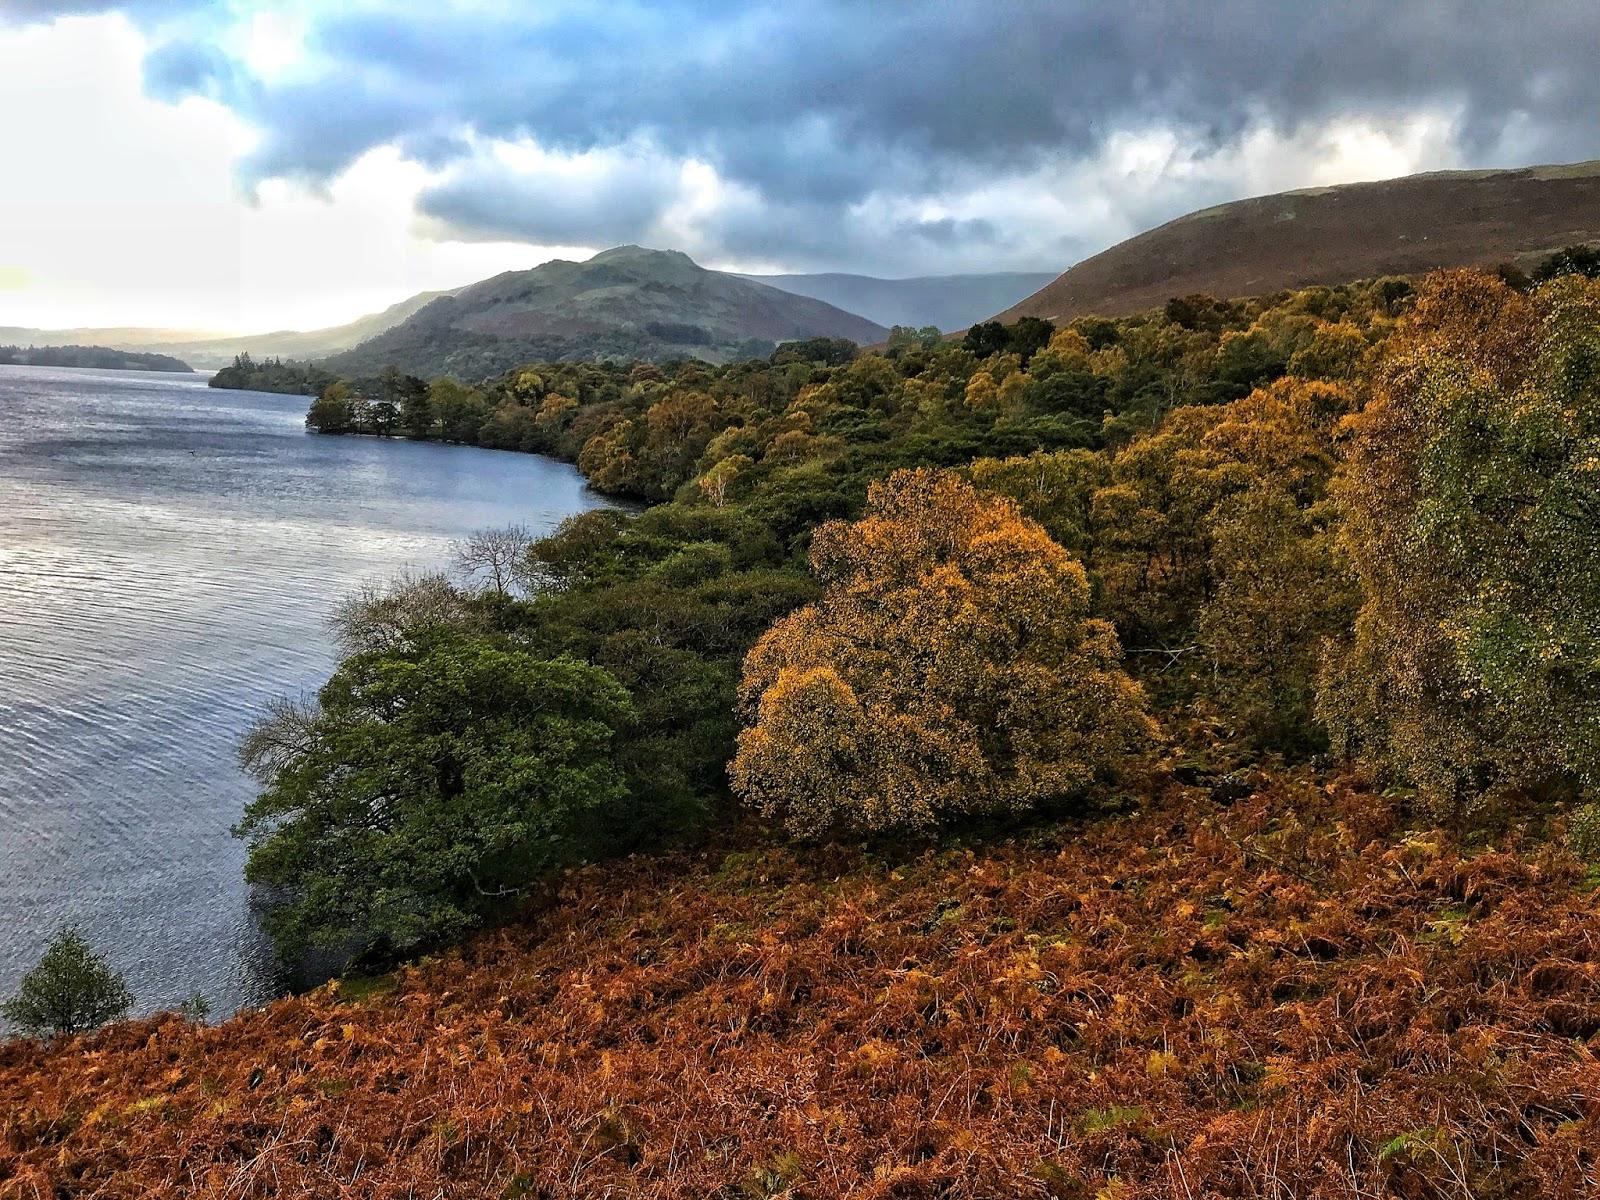 #WMGT, #WMGlobalTravellers, #LakeDistrict, #Ullswater, #Windermere, #Ambleside, #BritishCountryside, #theLifeofaSocialButterfly, #WheresMollie, #tblogger, #TravelBlogger, #GroupTravel, #Adventure, #Weekend, #SoloTravel, #travel, #VisitEngland, #England, #Cumbria, #Scenic, #GreatBritain, #YHA, #Hostel, #YHAAmbleside, #nature